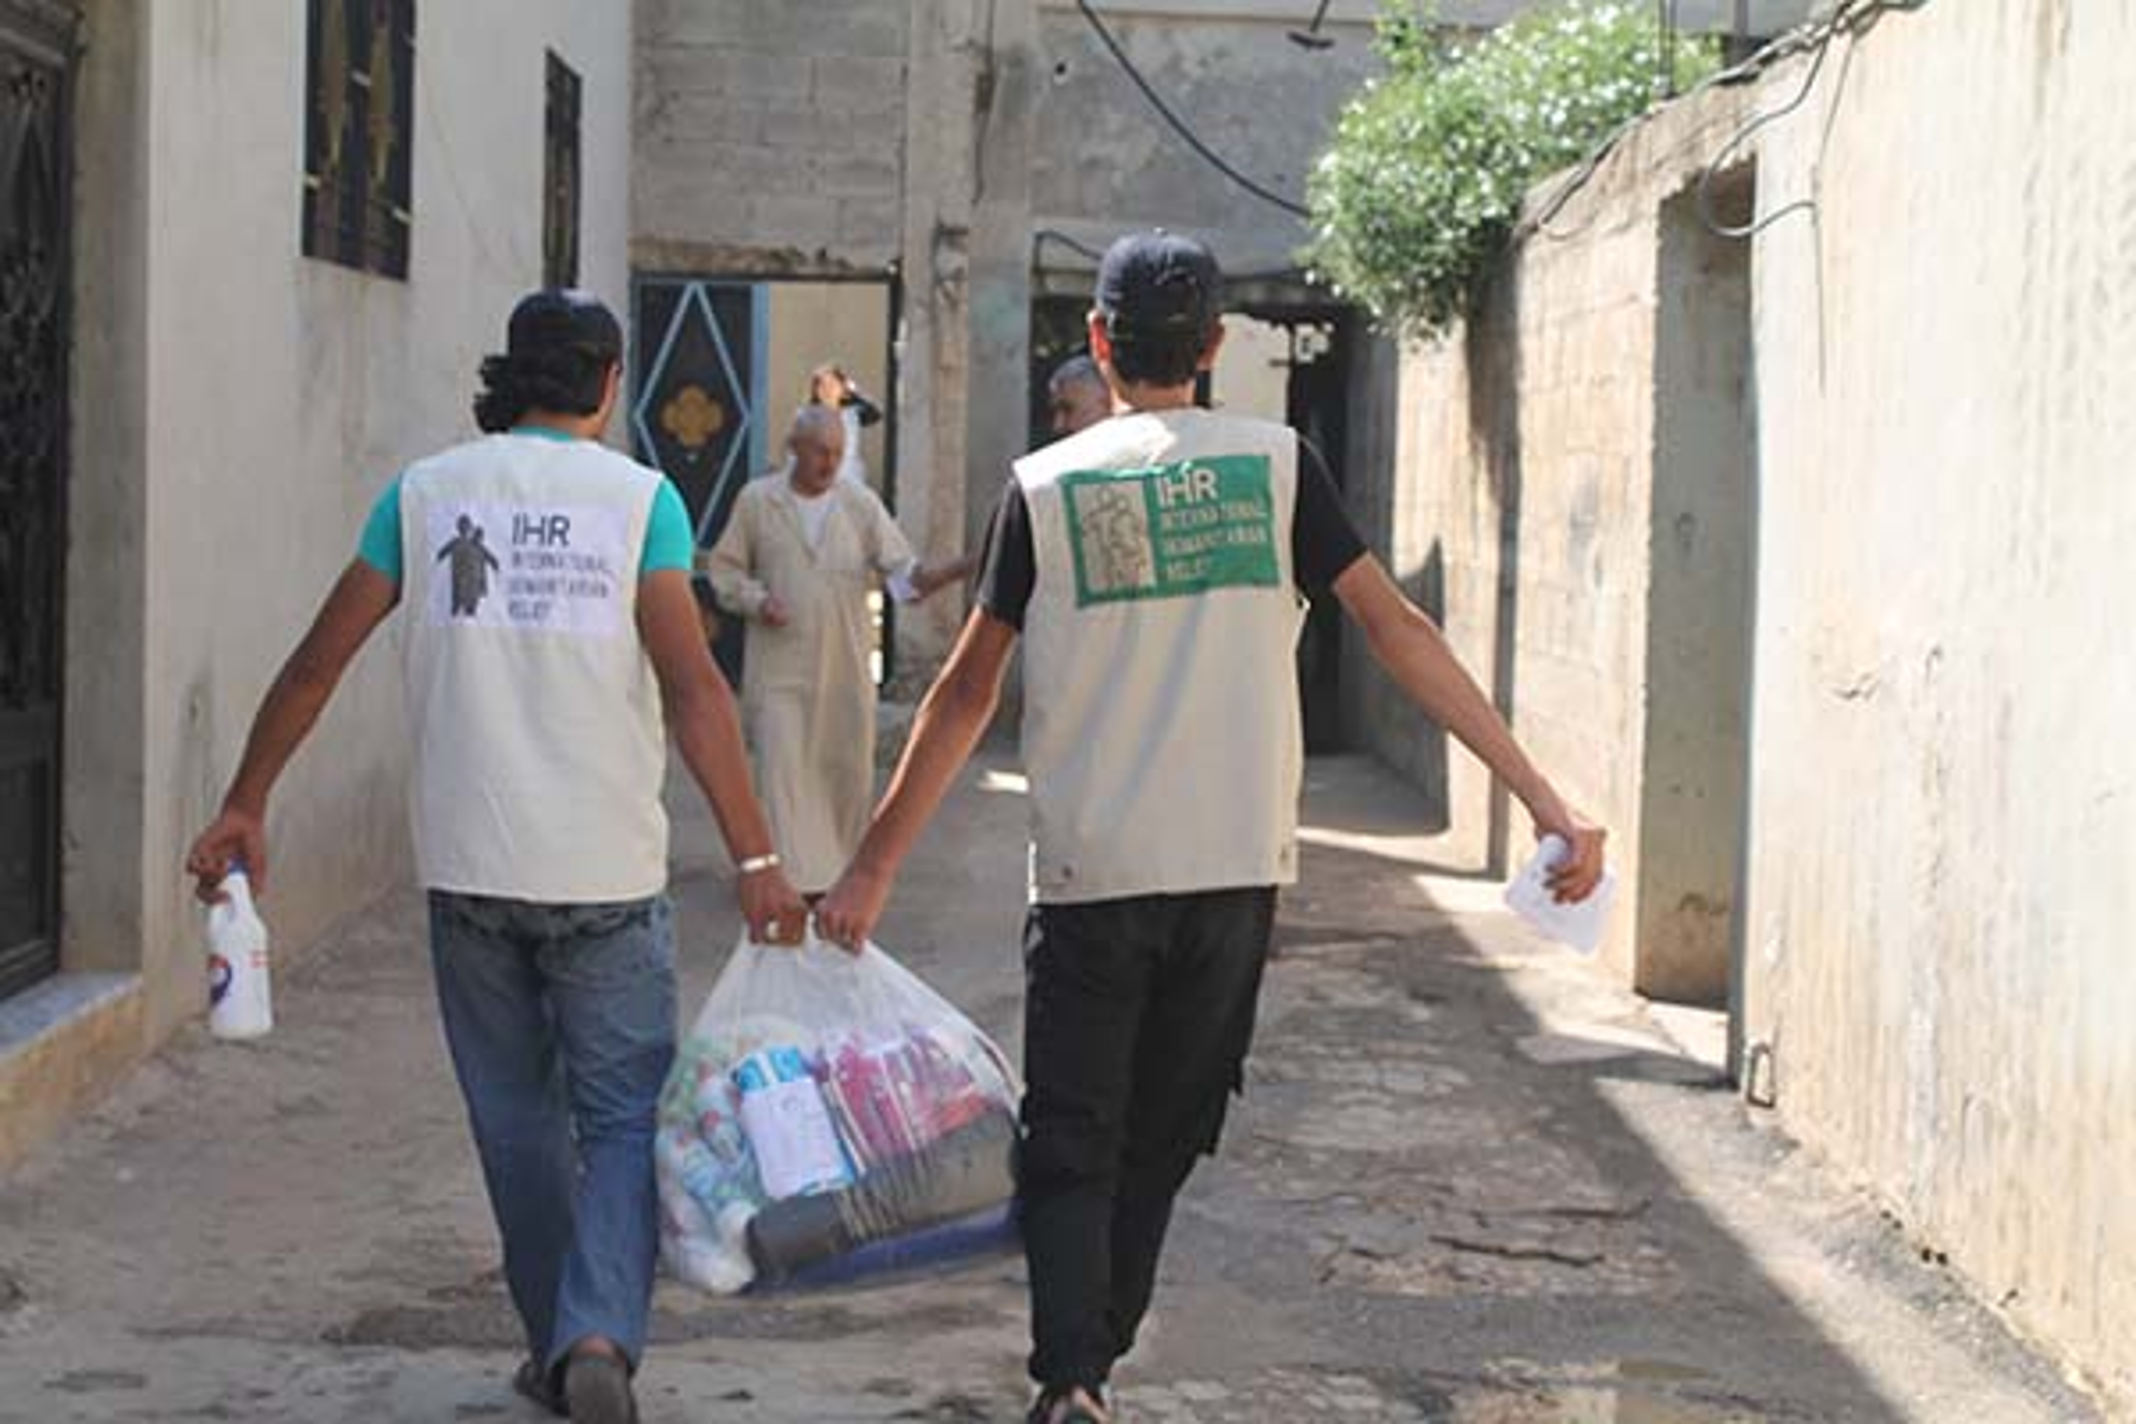 مشروع سلل صحية -ريف حمص الشماليHome